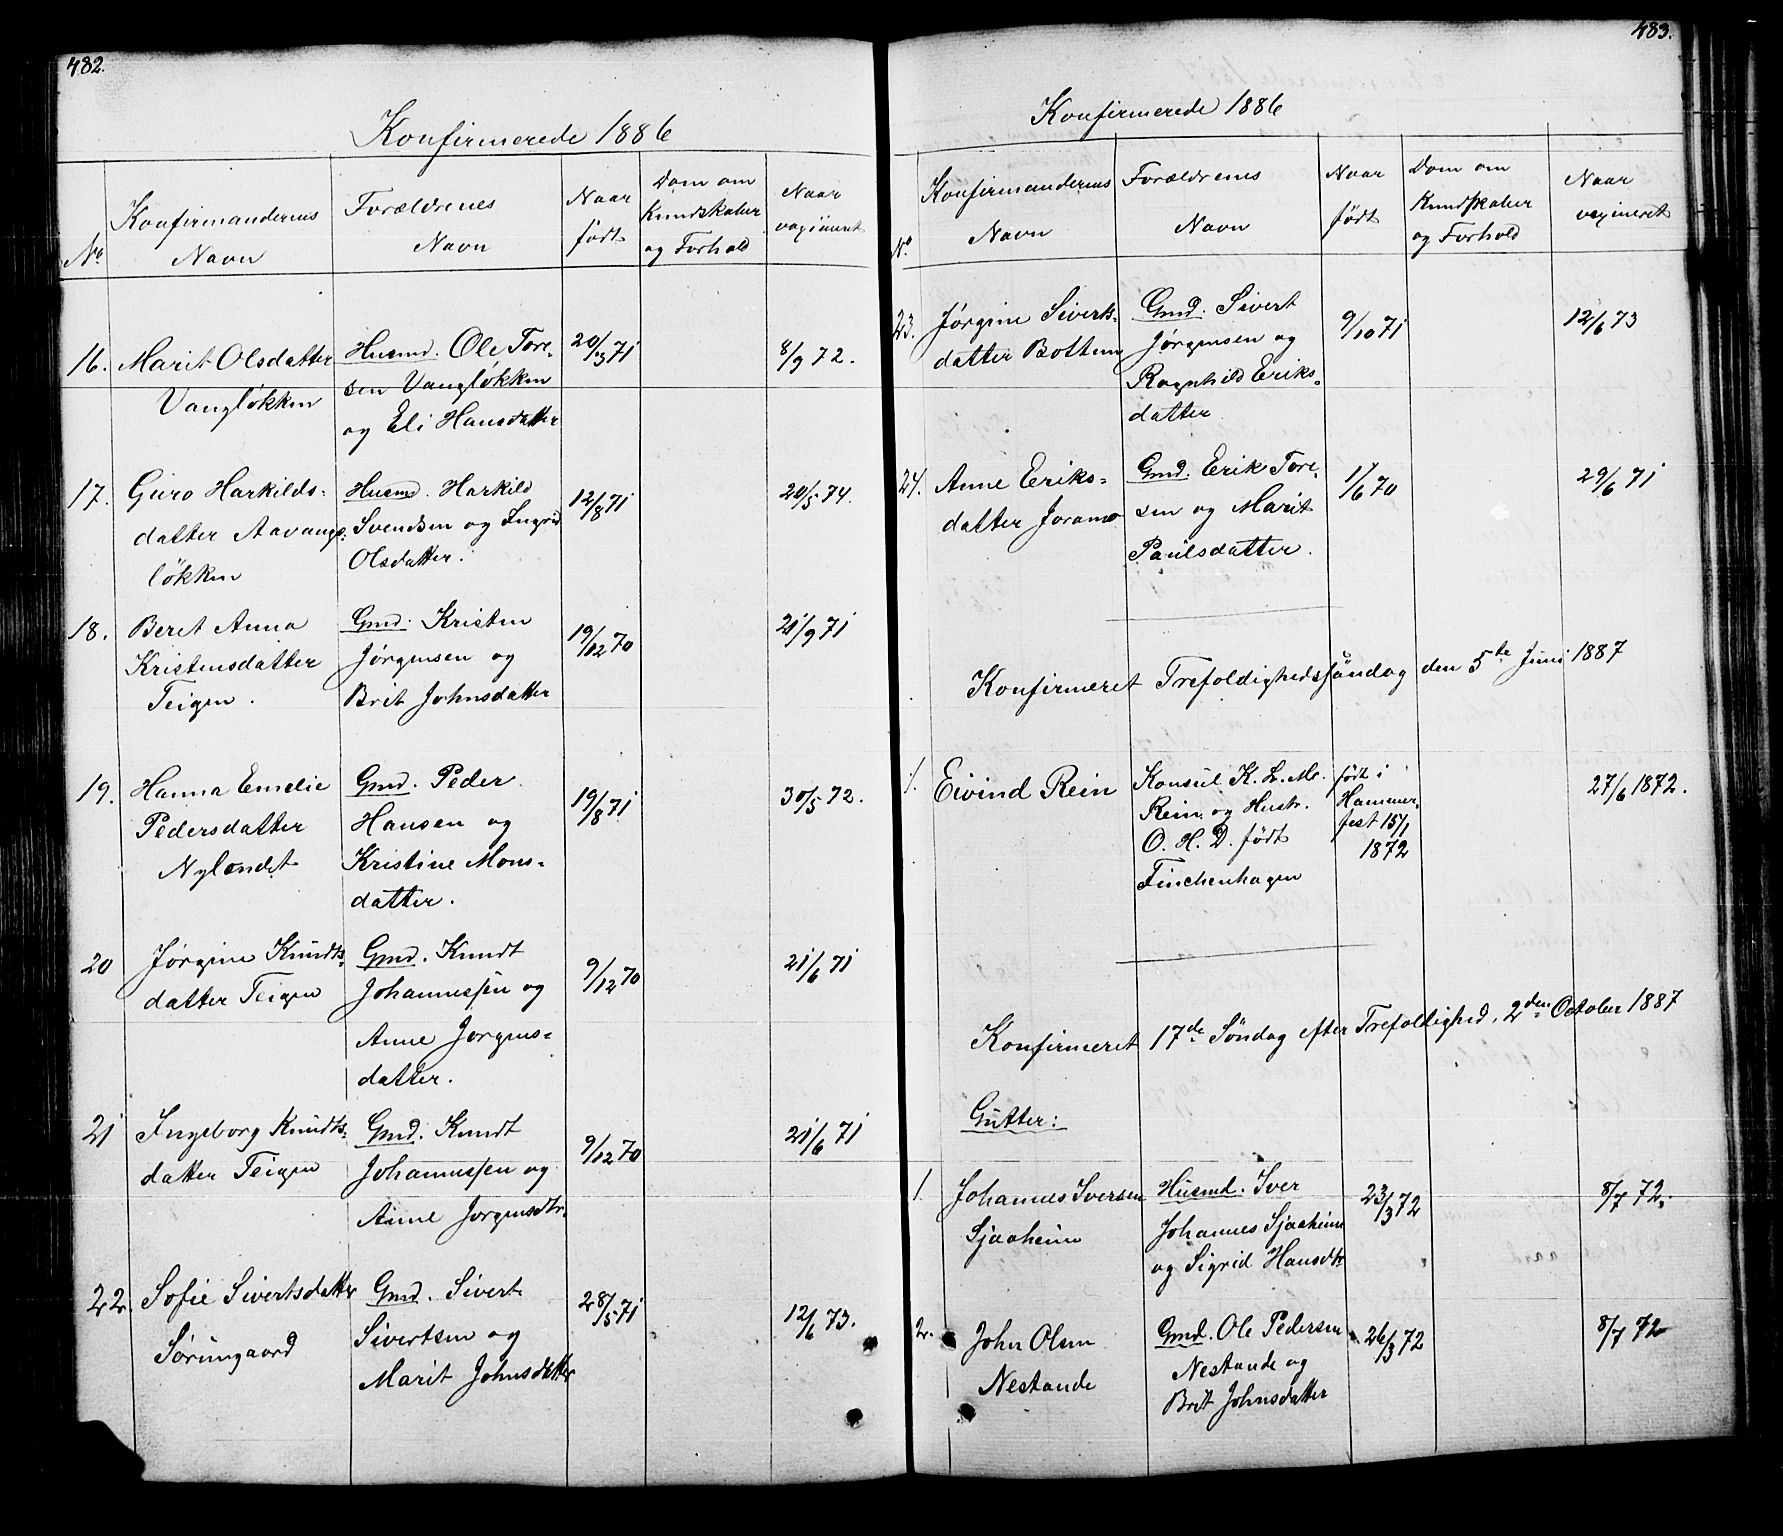 SAH, Lesja prestekontor, Klokkerbok nr. 5, 1850-1894, s. 482-483